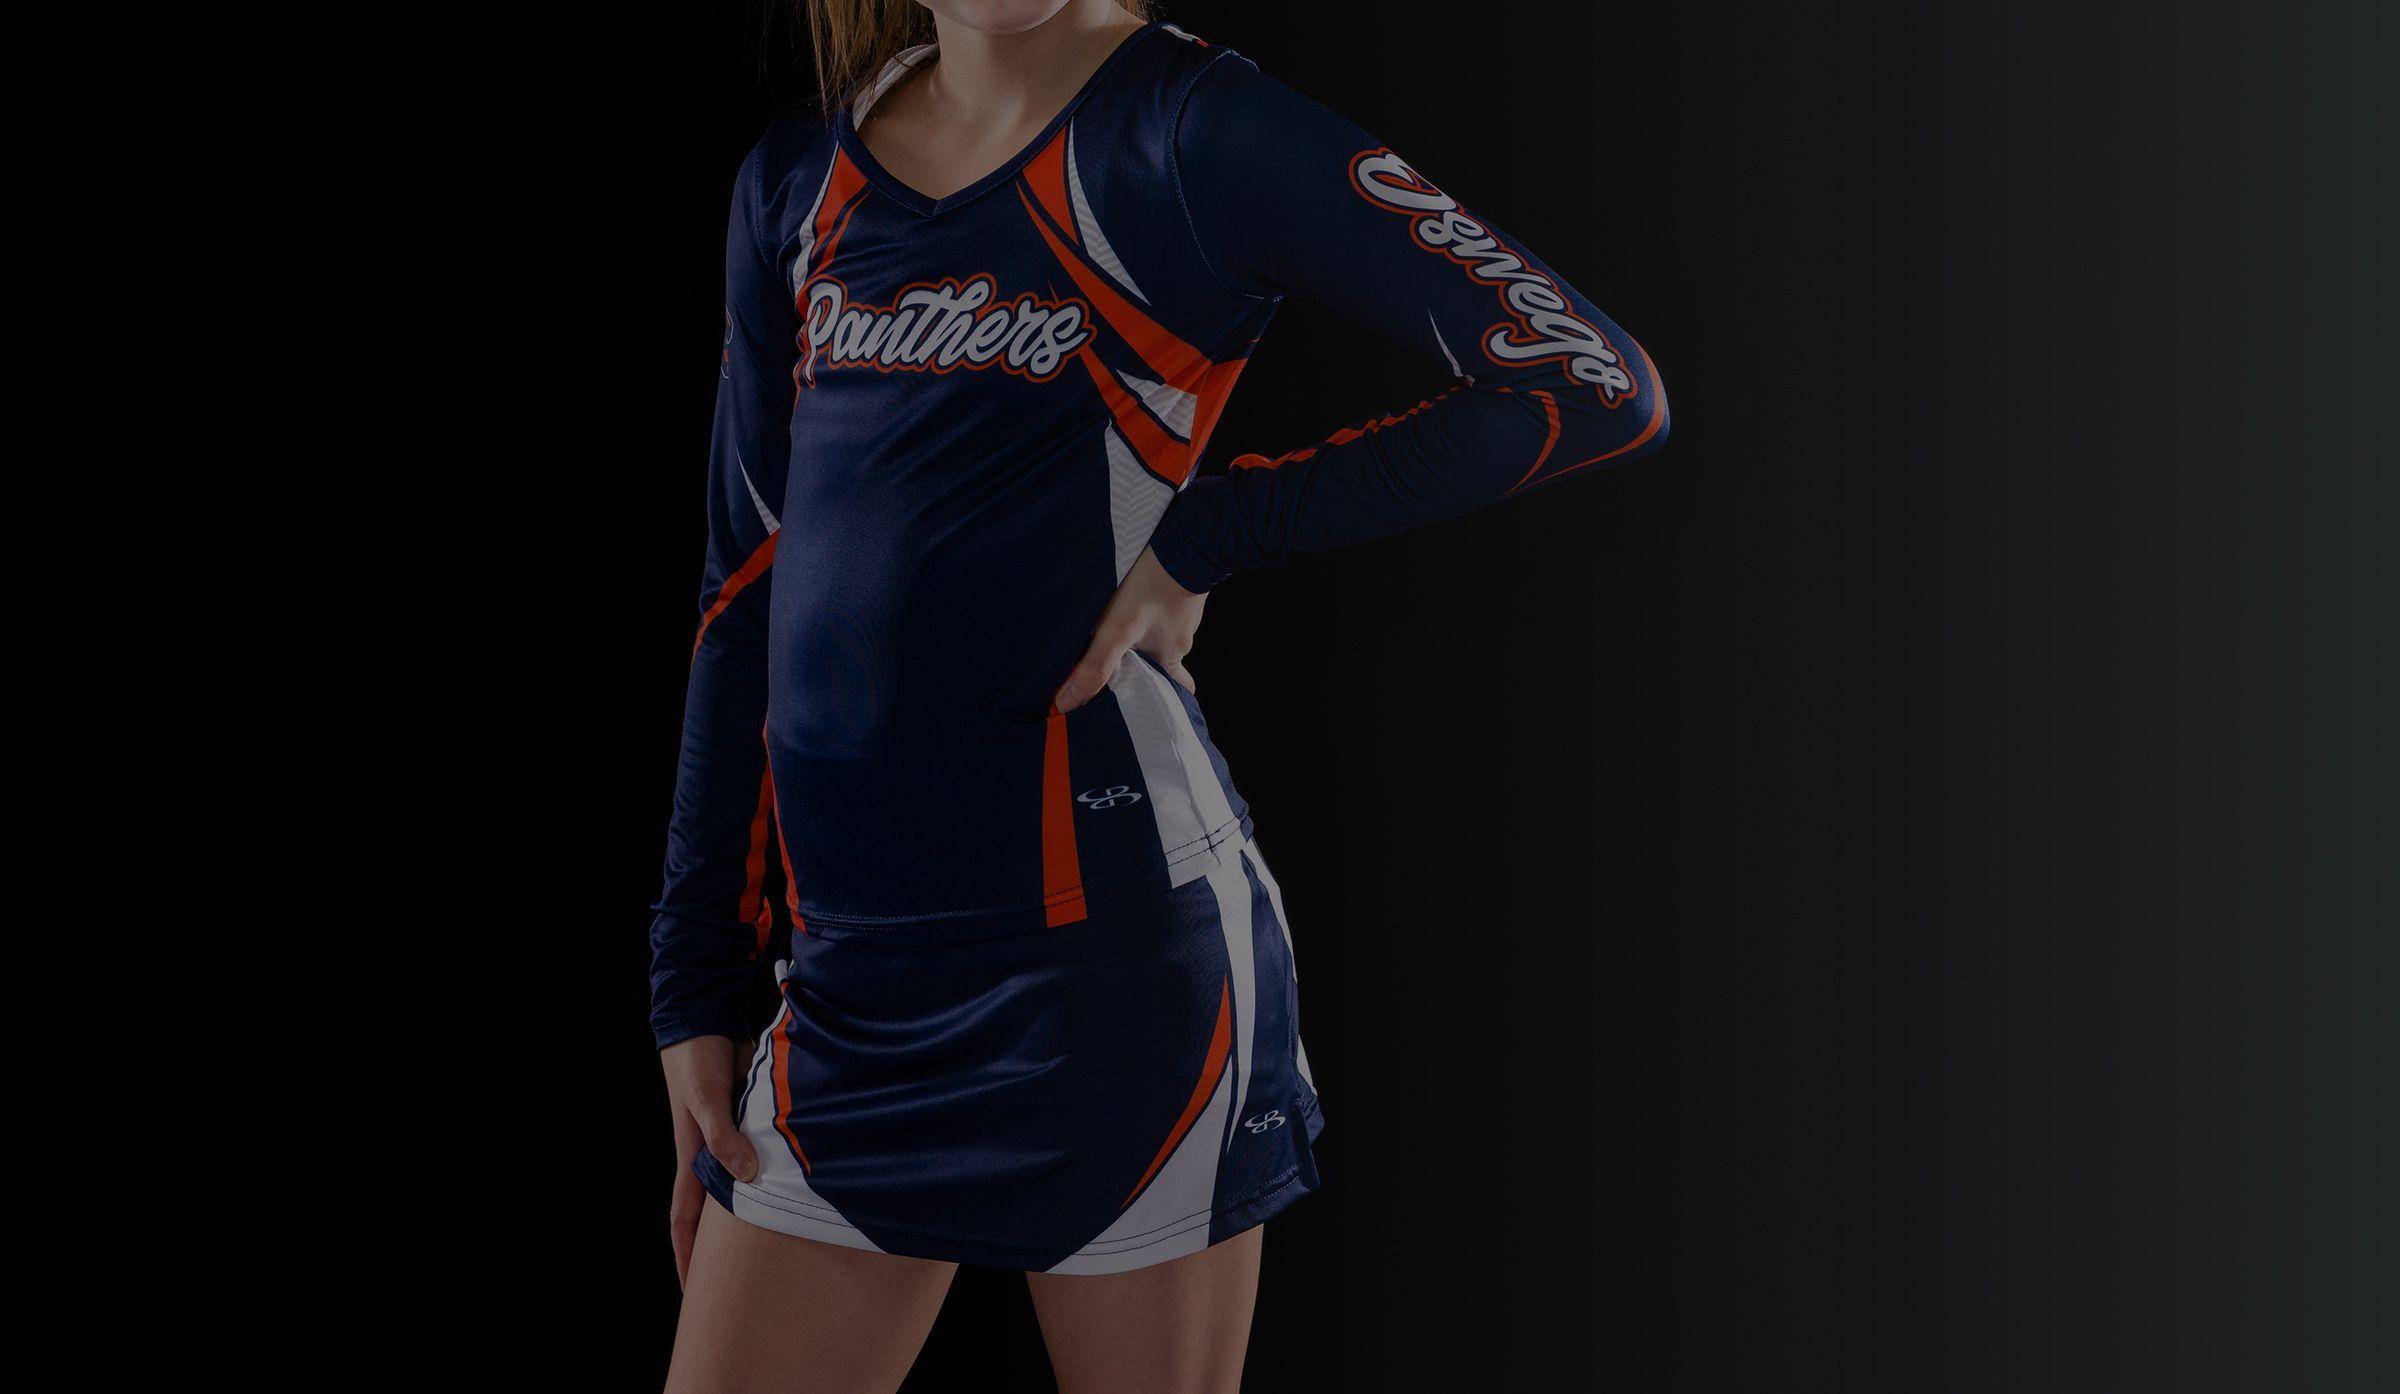 8f2a6a76318 Custom Uniforms   Jerseys